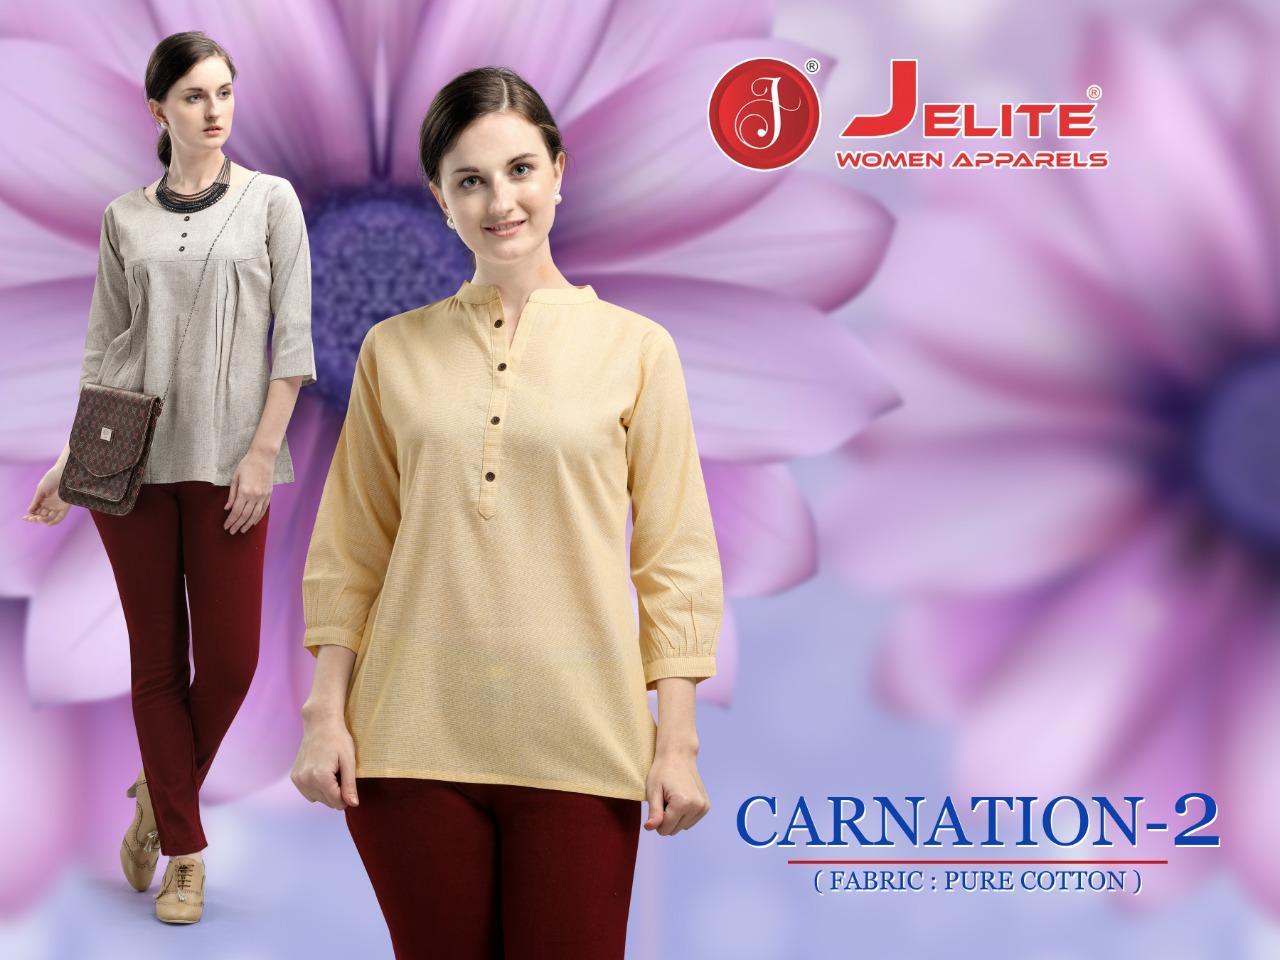 Jelite Carnation Vol 2 Tops Wholesale Catalog 8 Pcs 1 - Jelite Carnation Vol 2 Tops Wholesale Catalog 8 Pcs